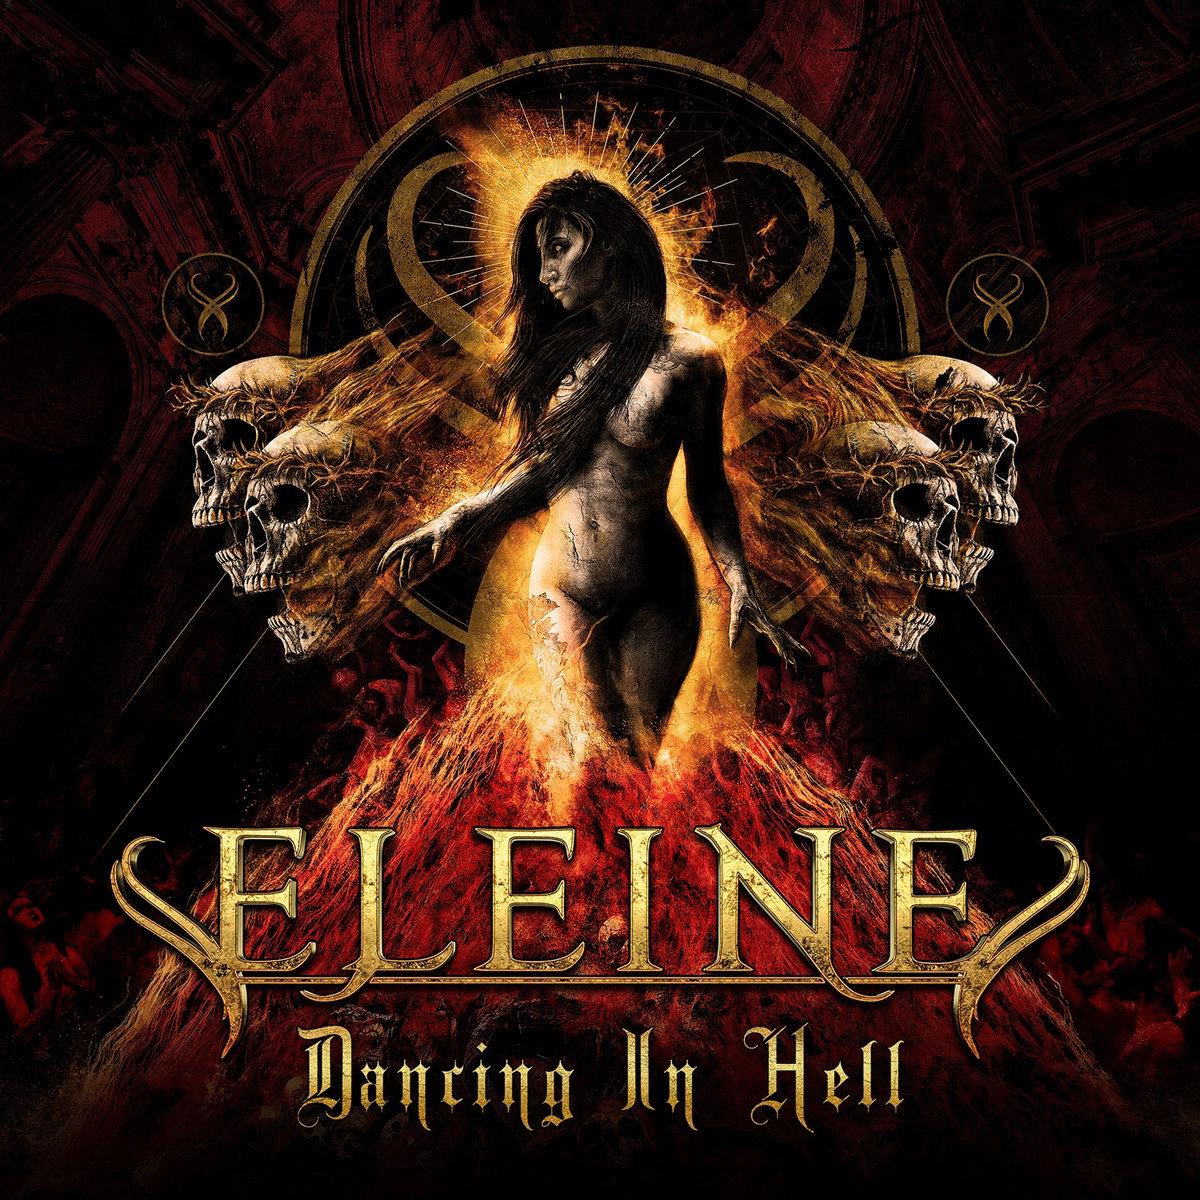 Dancing in Hell Eleine